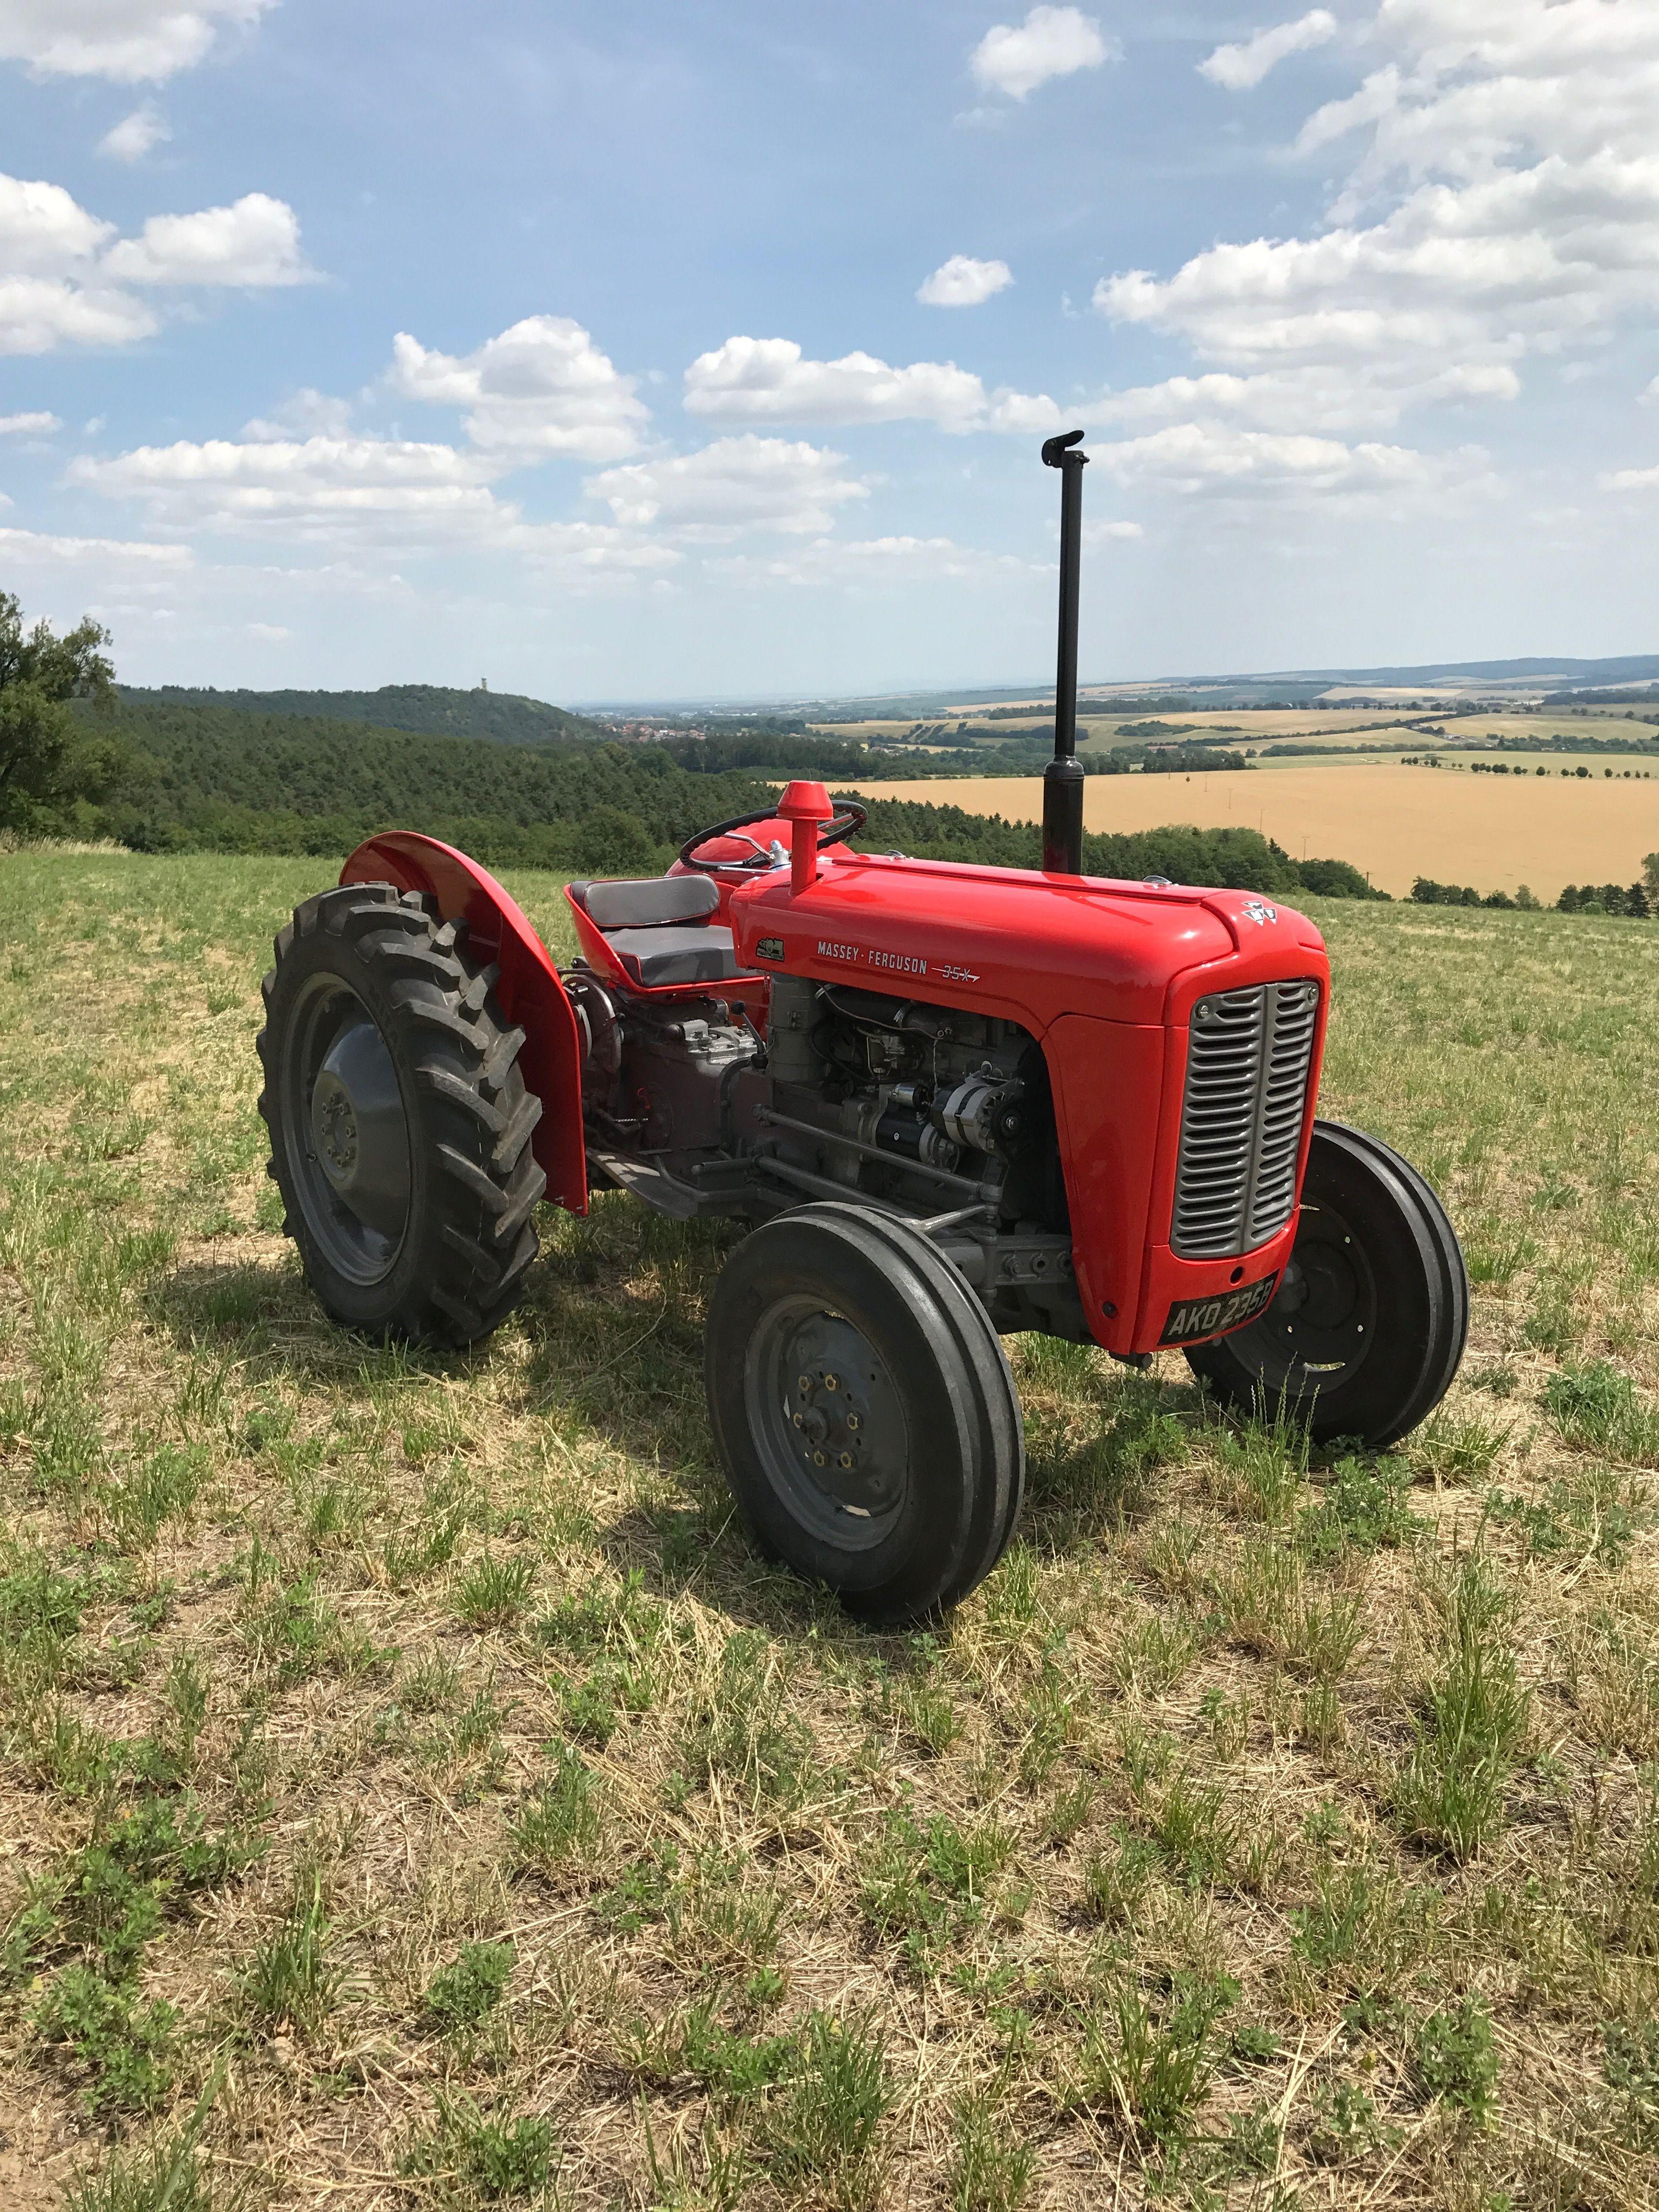 Tractor Pulling Calendario 2020.1962 Massey Ferguson 35x Farm Dreams Tractors Old